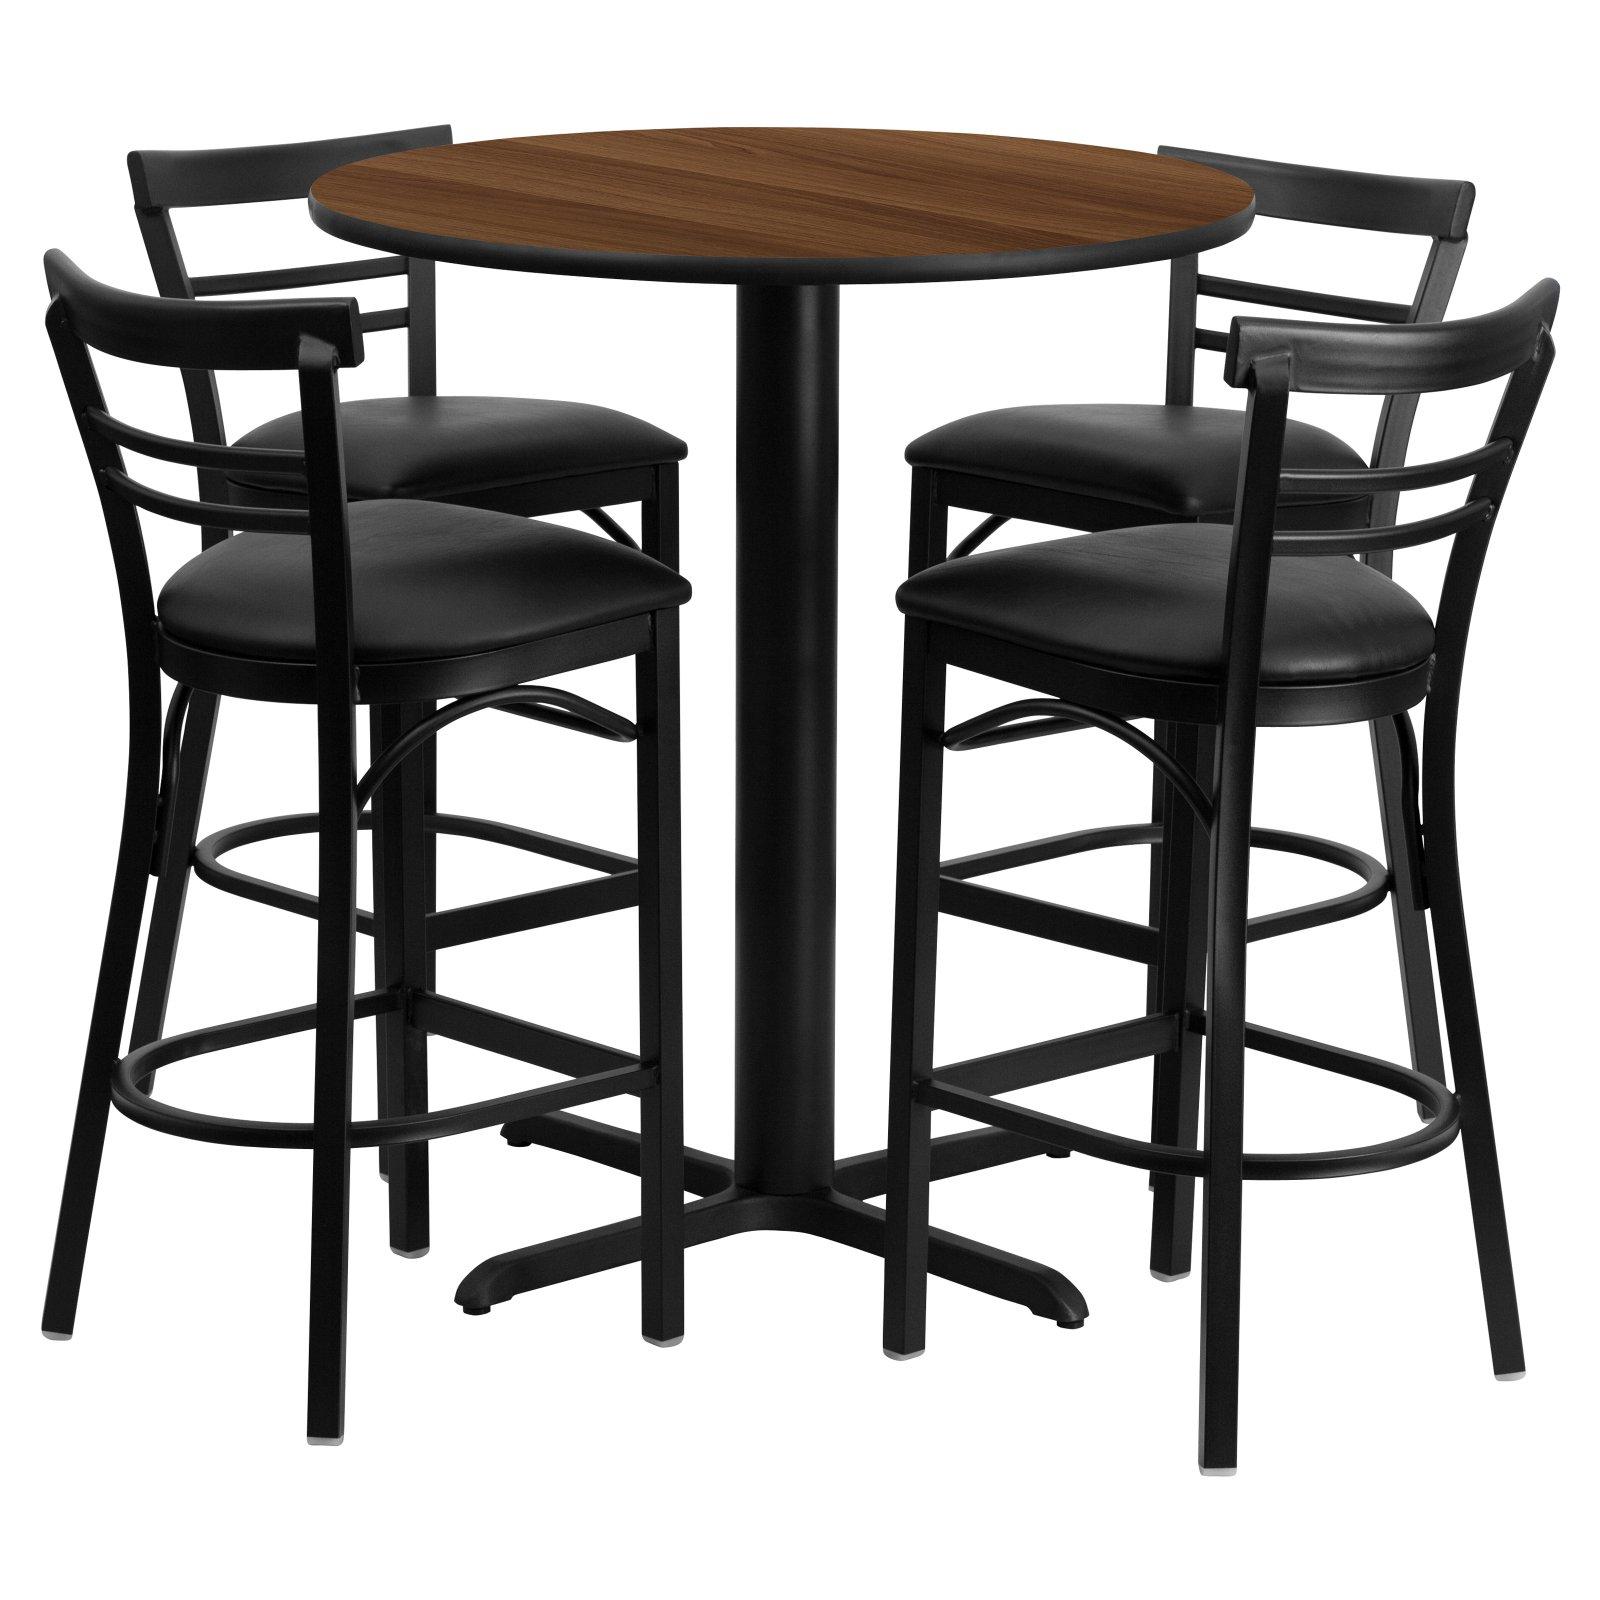 Flash Furniture 24'' Round Walnut Laminate Table Set with 4 Ladder Back Metal Barstools, Black Vinyl Seat Black, Walnut